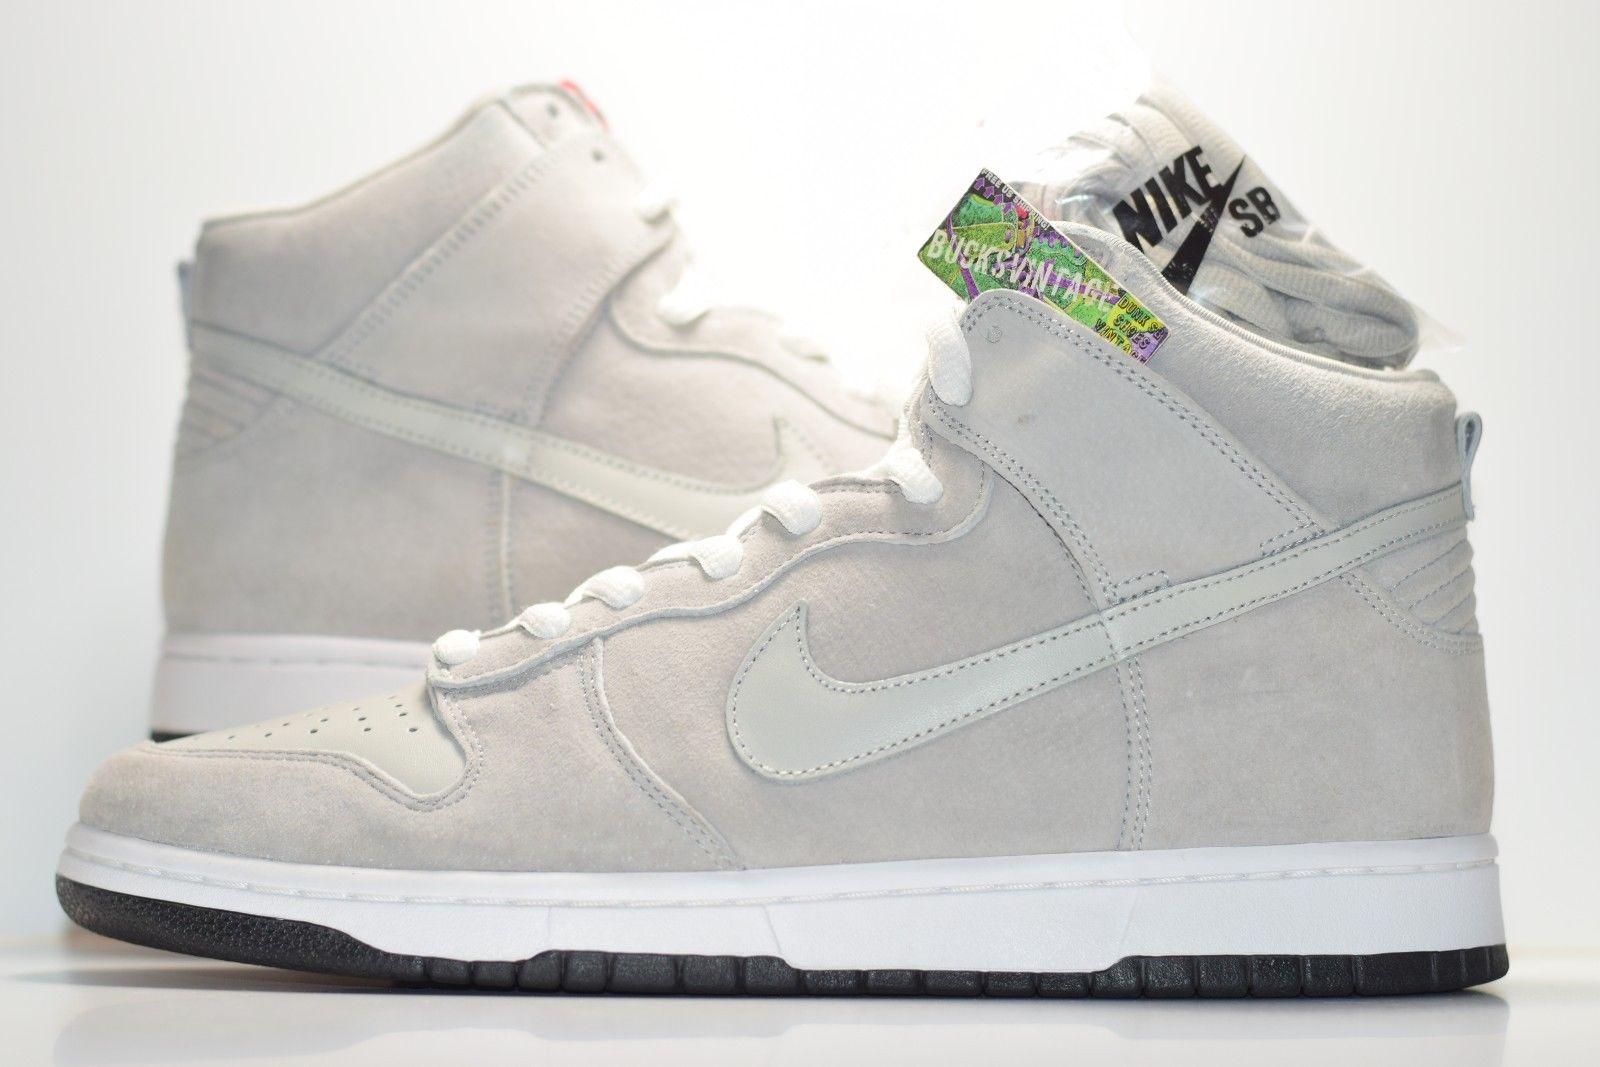 premium selection f7287 f63b3 Size 11   2007 Nike Dunk High PEE WEE HERMAN Fallen Heroes Pack #305050-004  grey heather/grey heather from BucksVintage